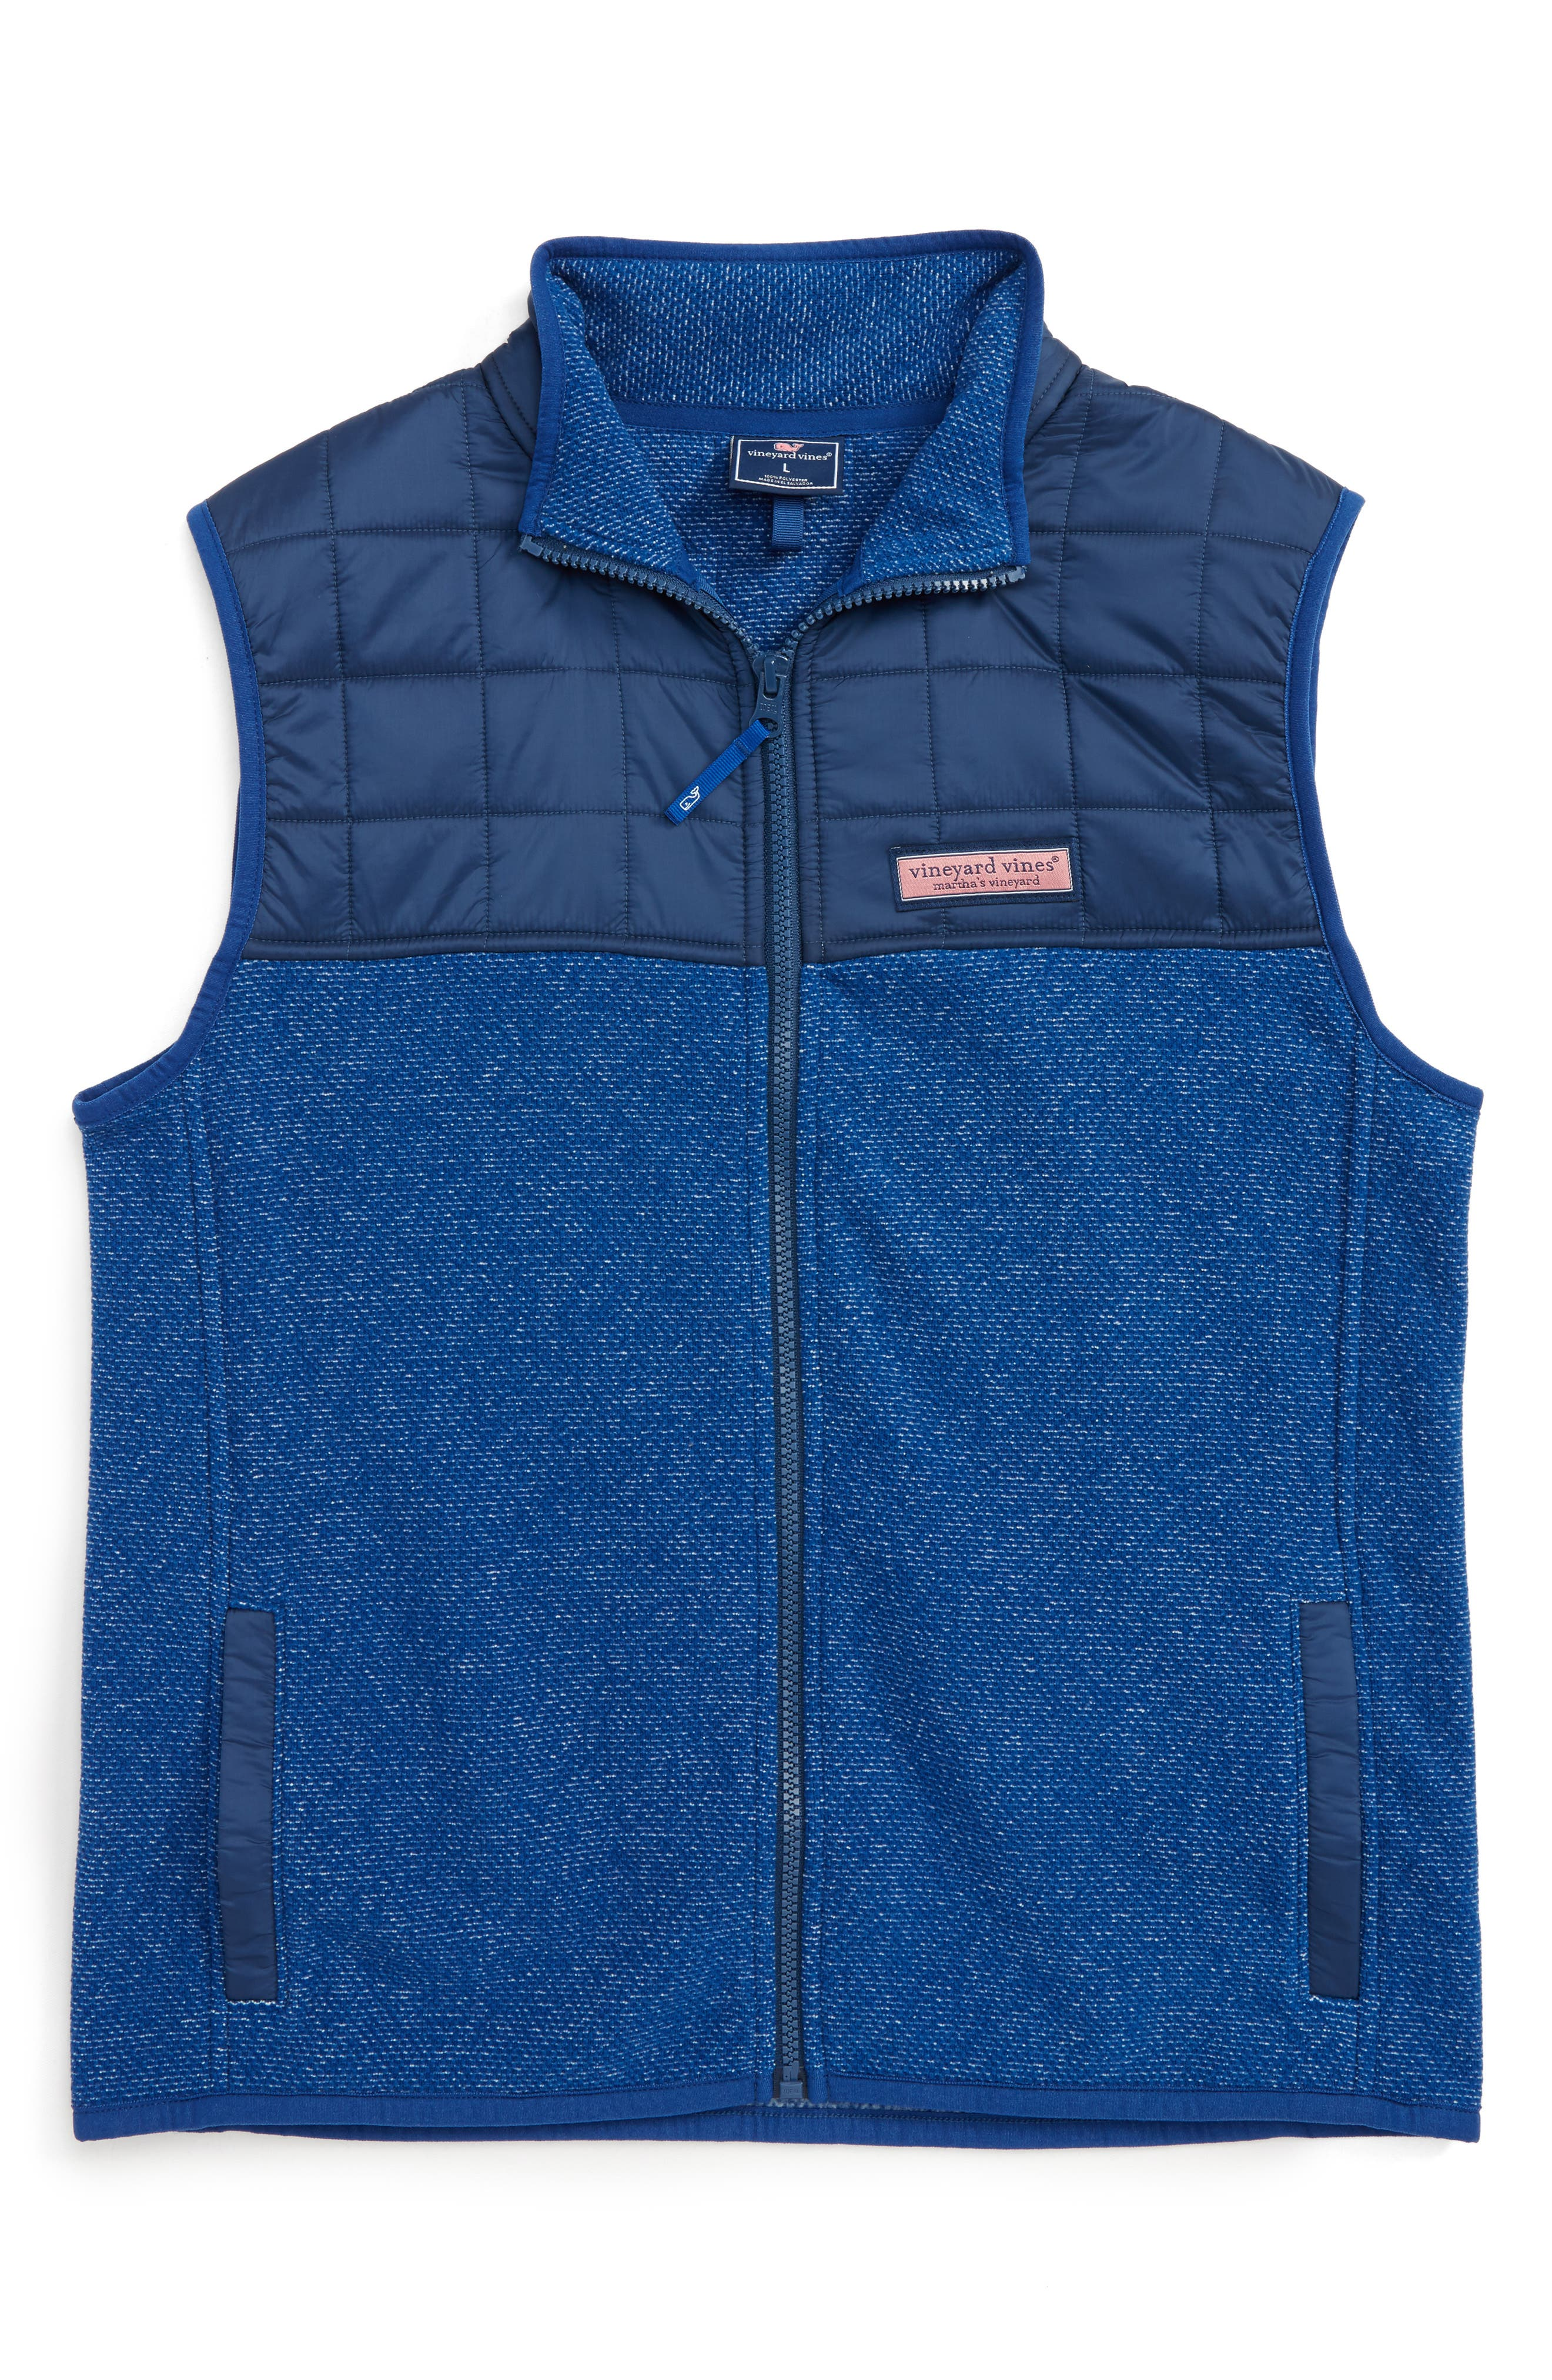 vineyard vines Jacquard Fleece Vest (Big Boys)